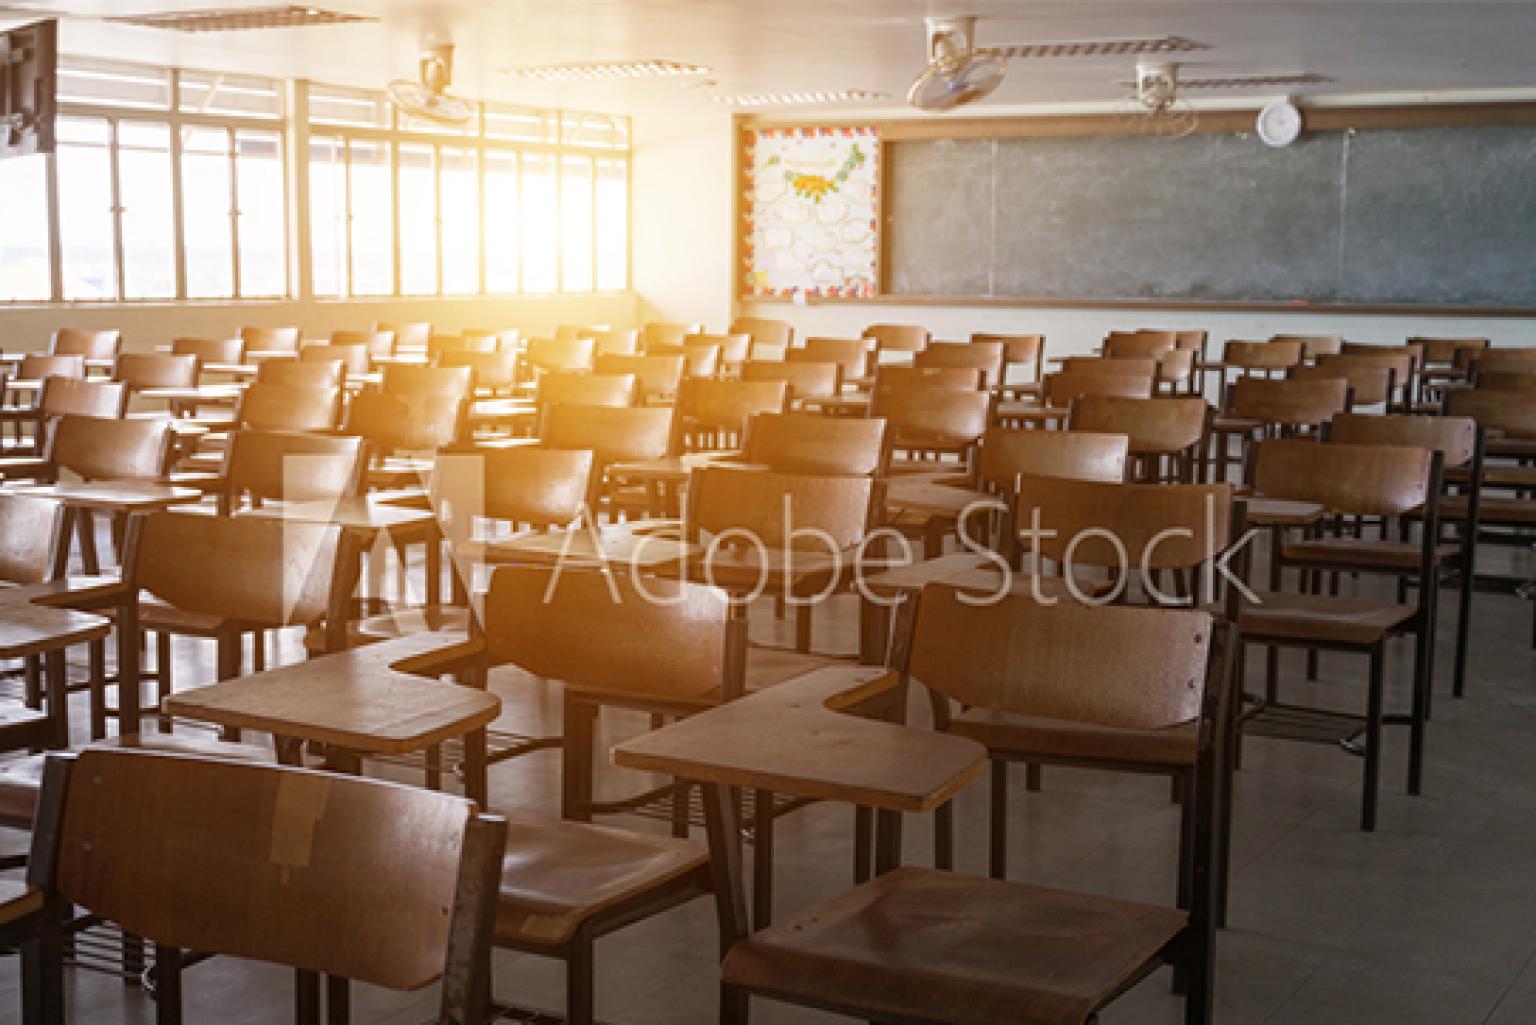 Adobe Stock Photo of School Berlin Twp School District